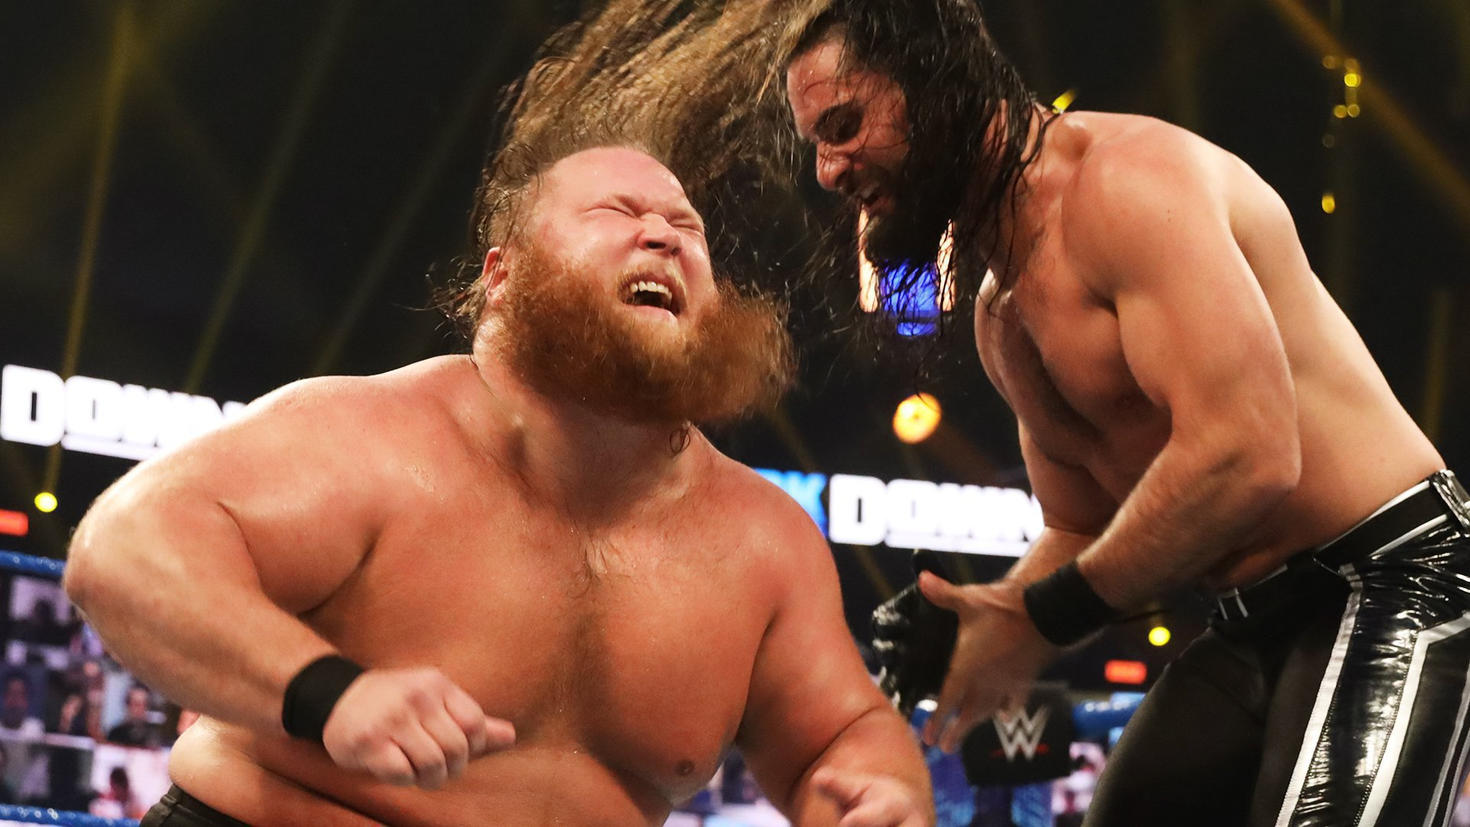 WWE Smackdown Preview (13/11/20): Survivor Series 2020 Buildups 2